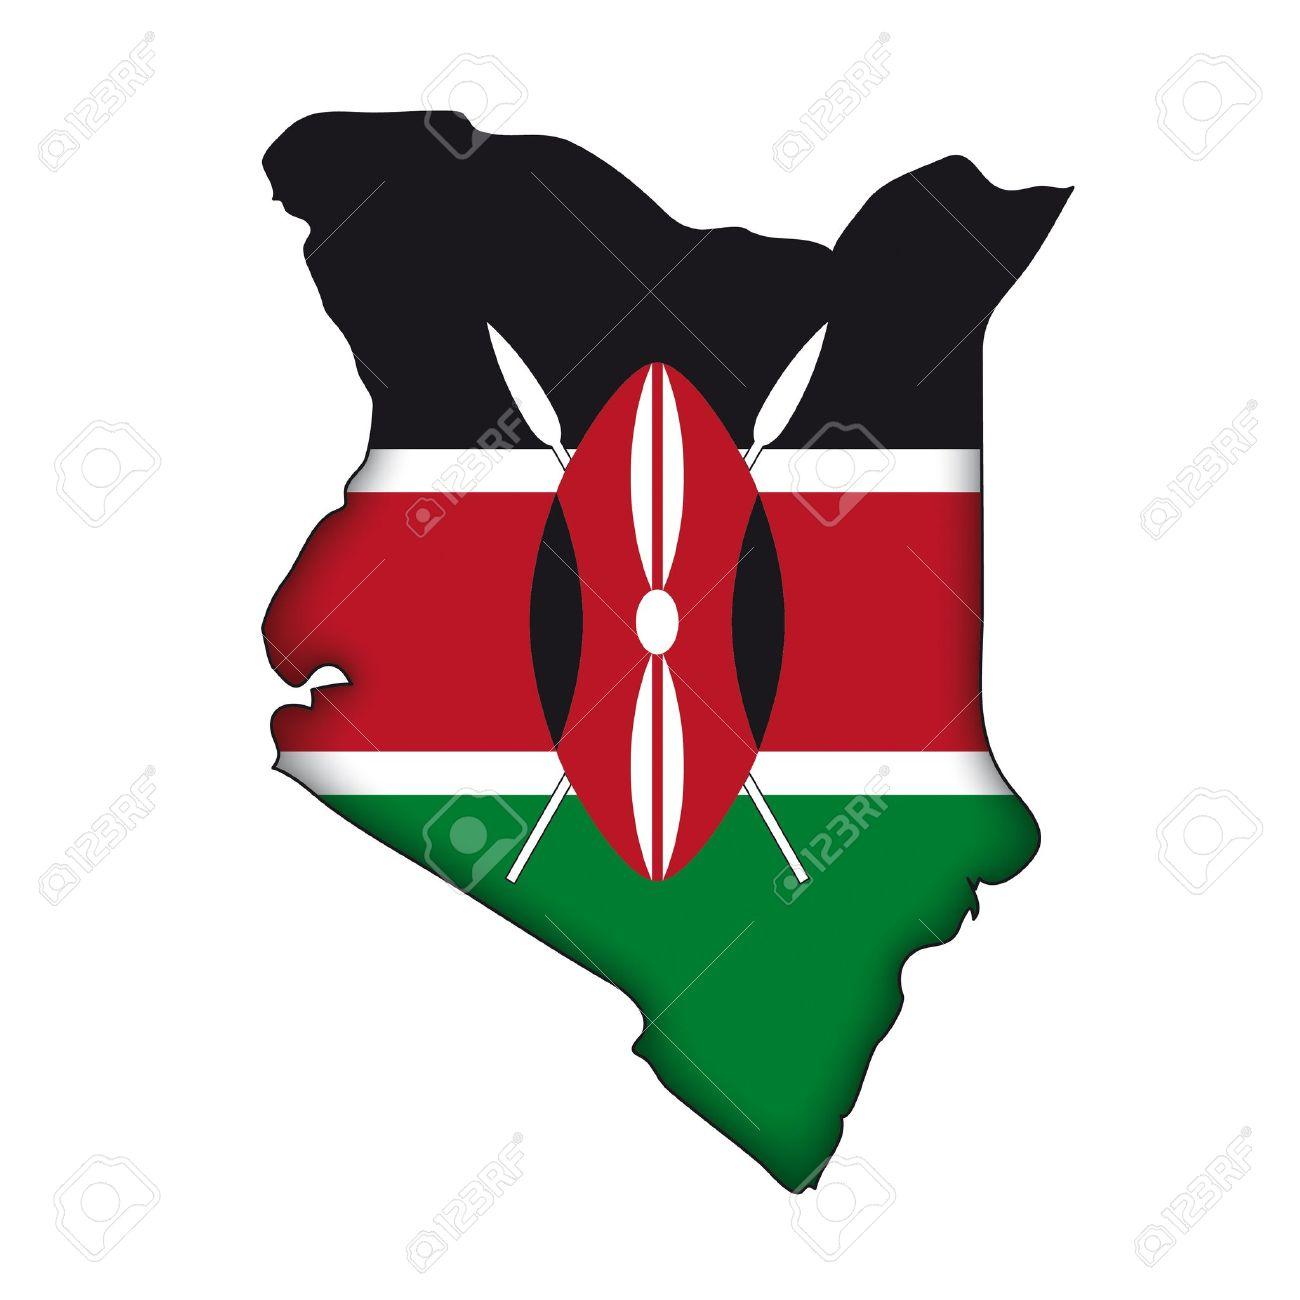 Map Of Kenya Clipart.